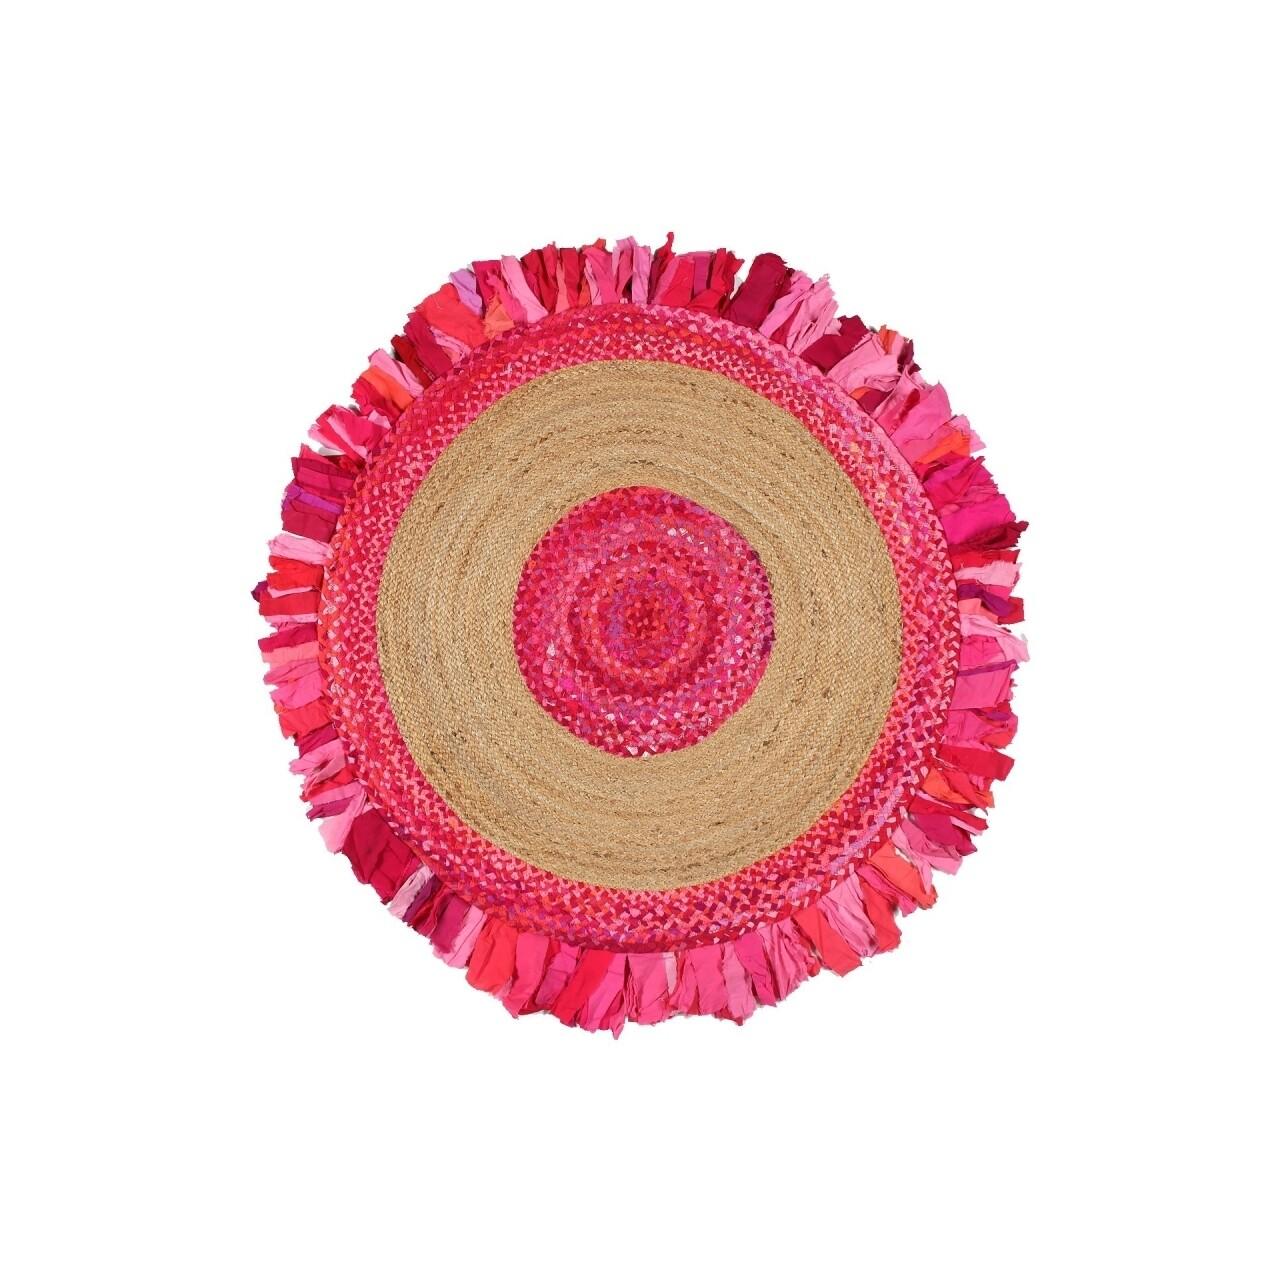 Covor lucrat manual Eko, MX 05 - Pink Q, 50% iuta, 50% bumbac,  150 cm Ø